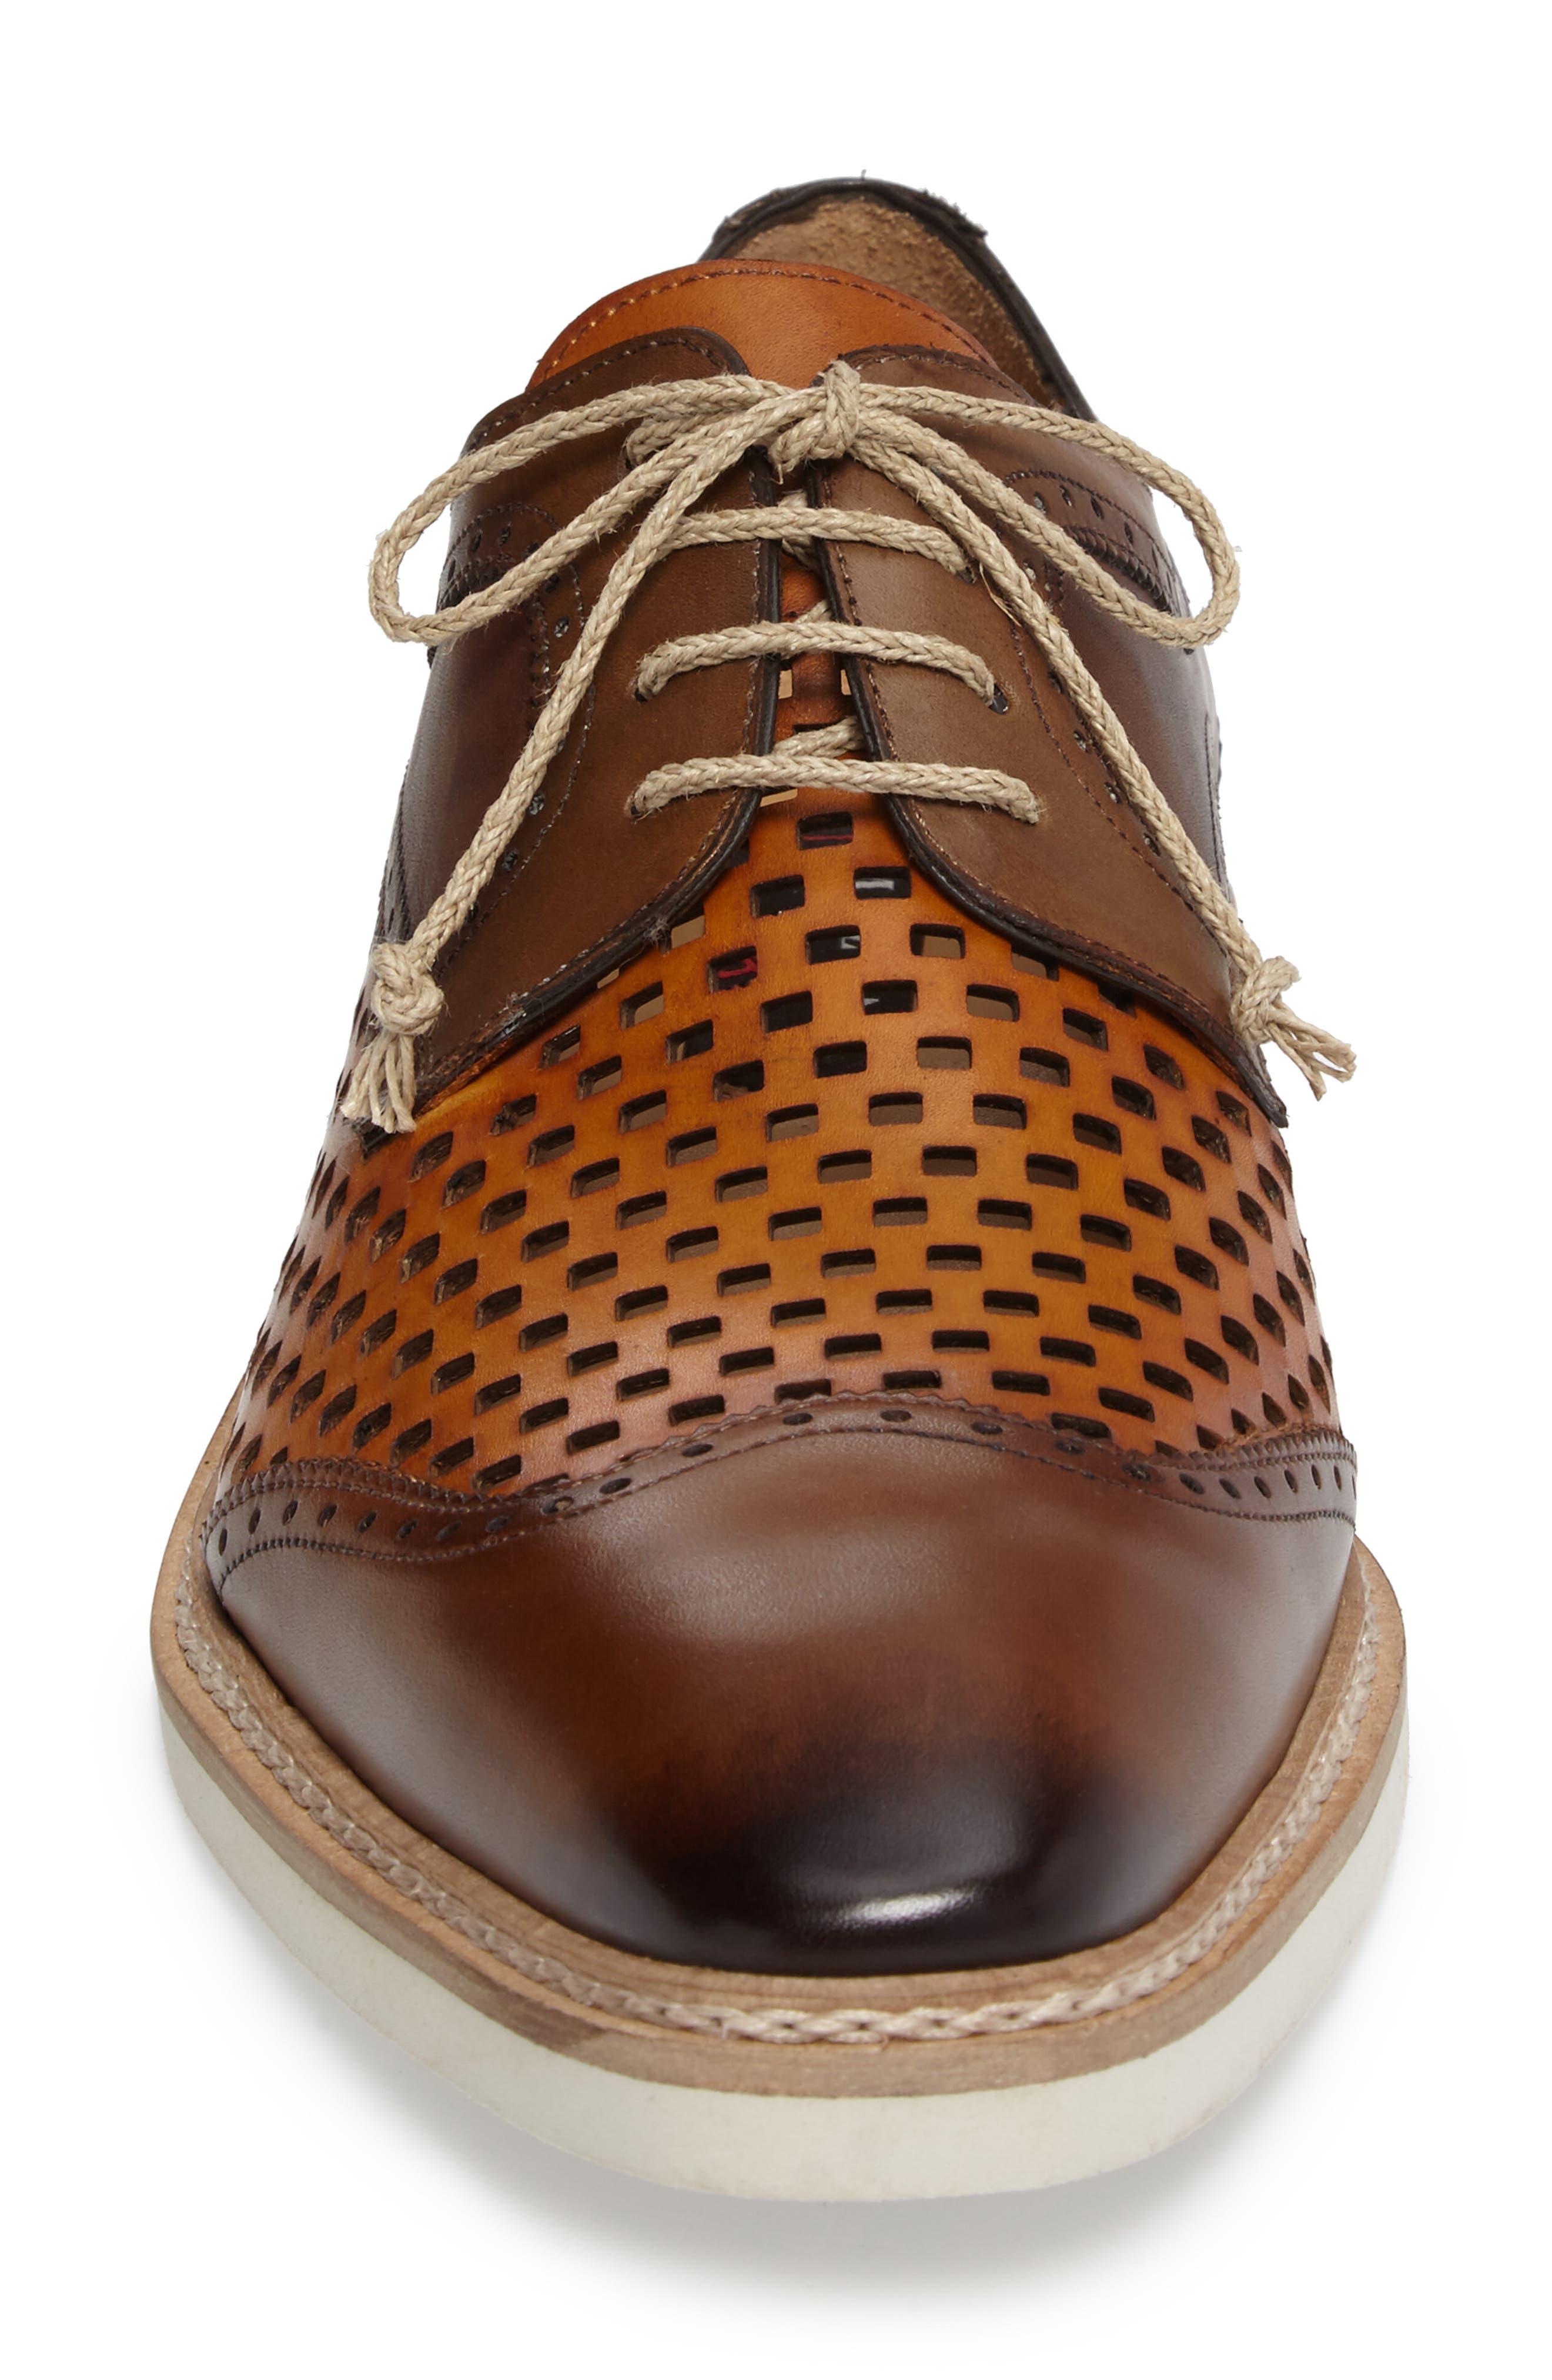 Alvarez Spectator Shoe,                             Alternate thumbnail 4, color,                             Cognac Multi Leather